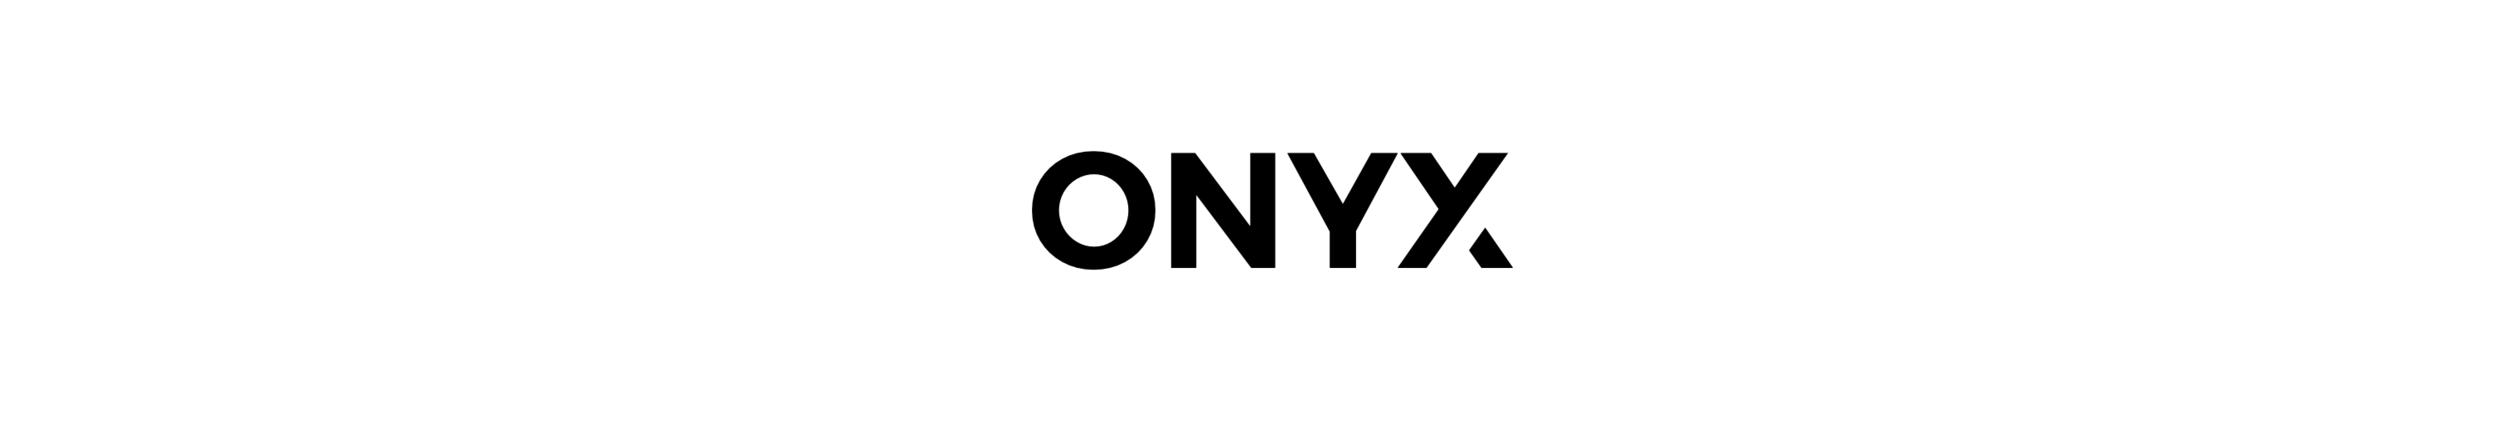 logo-design-ideas.png